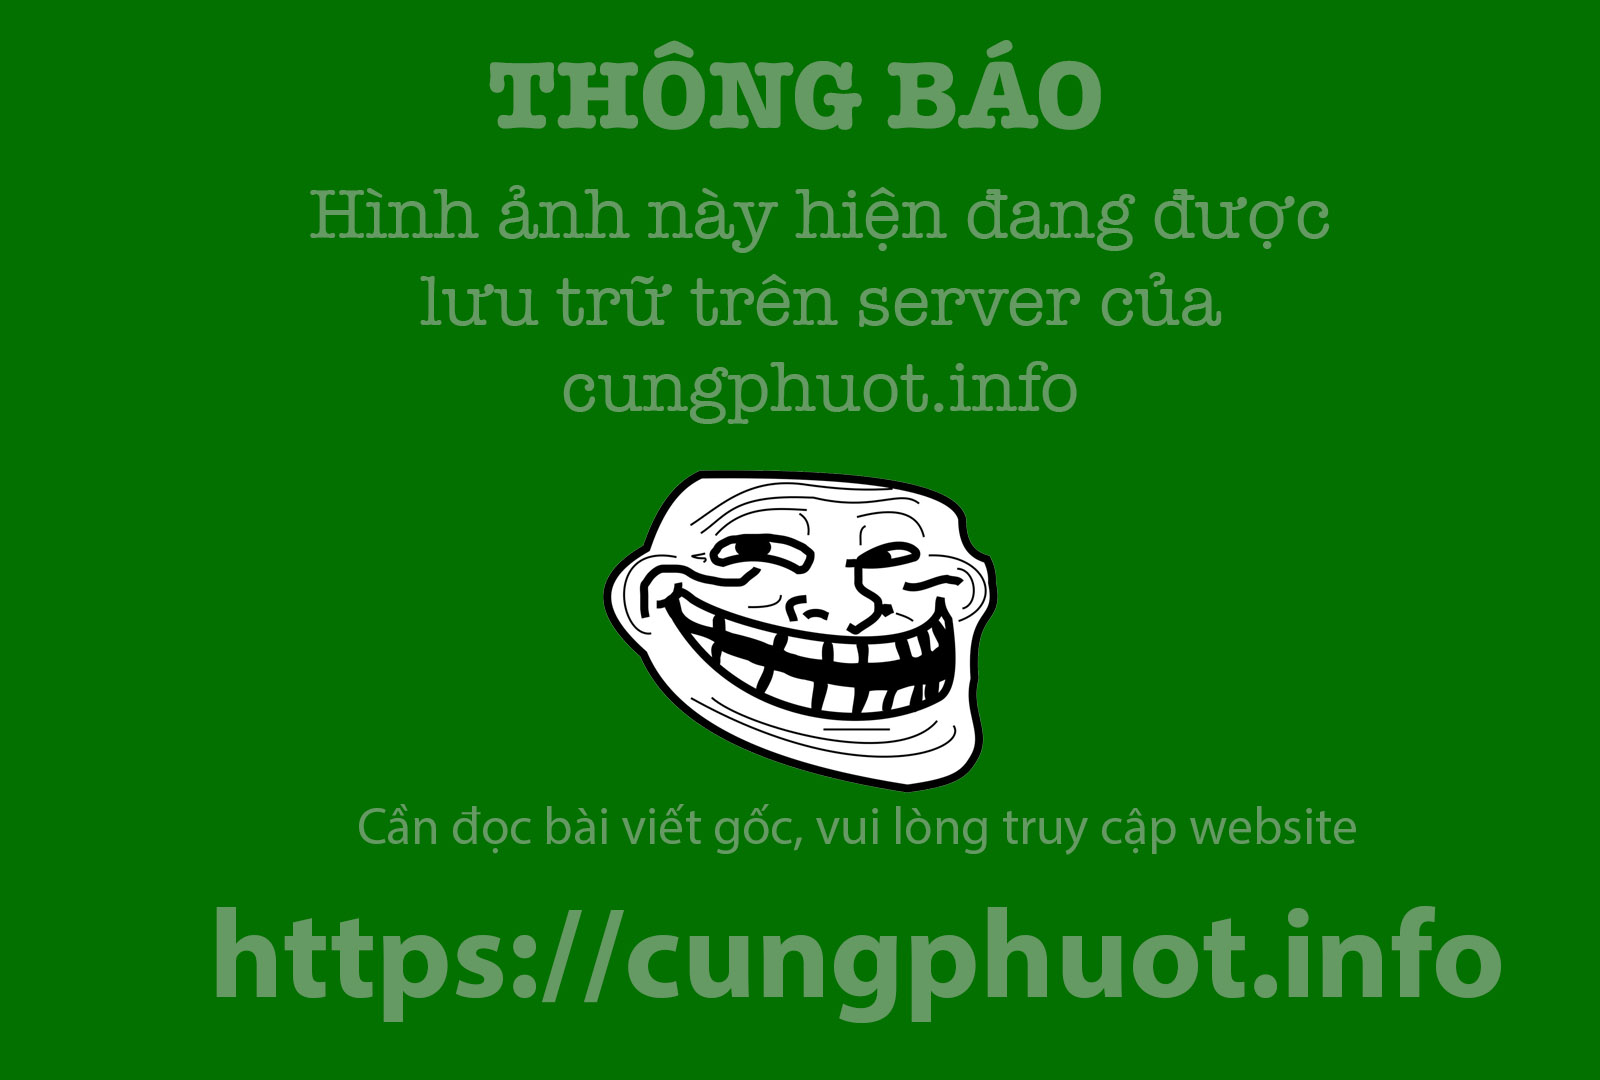 Ve dep thanh cao, huyen bi cua Dan vien Chau Son hinh anh 9